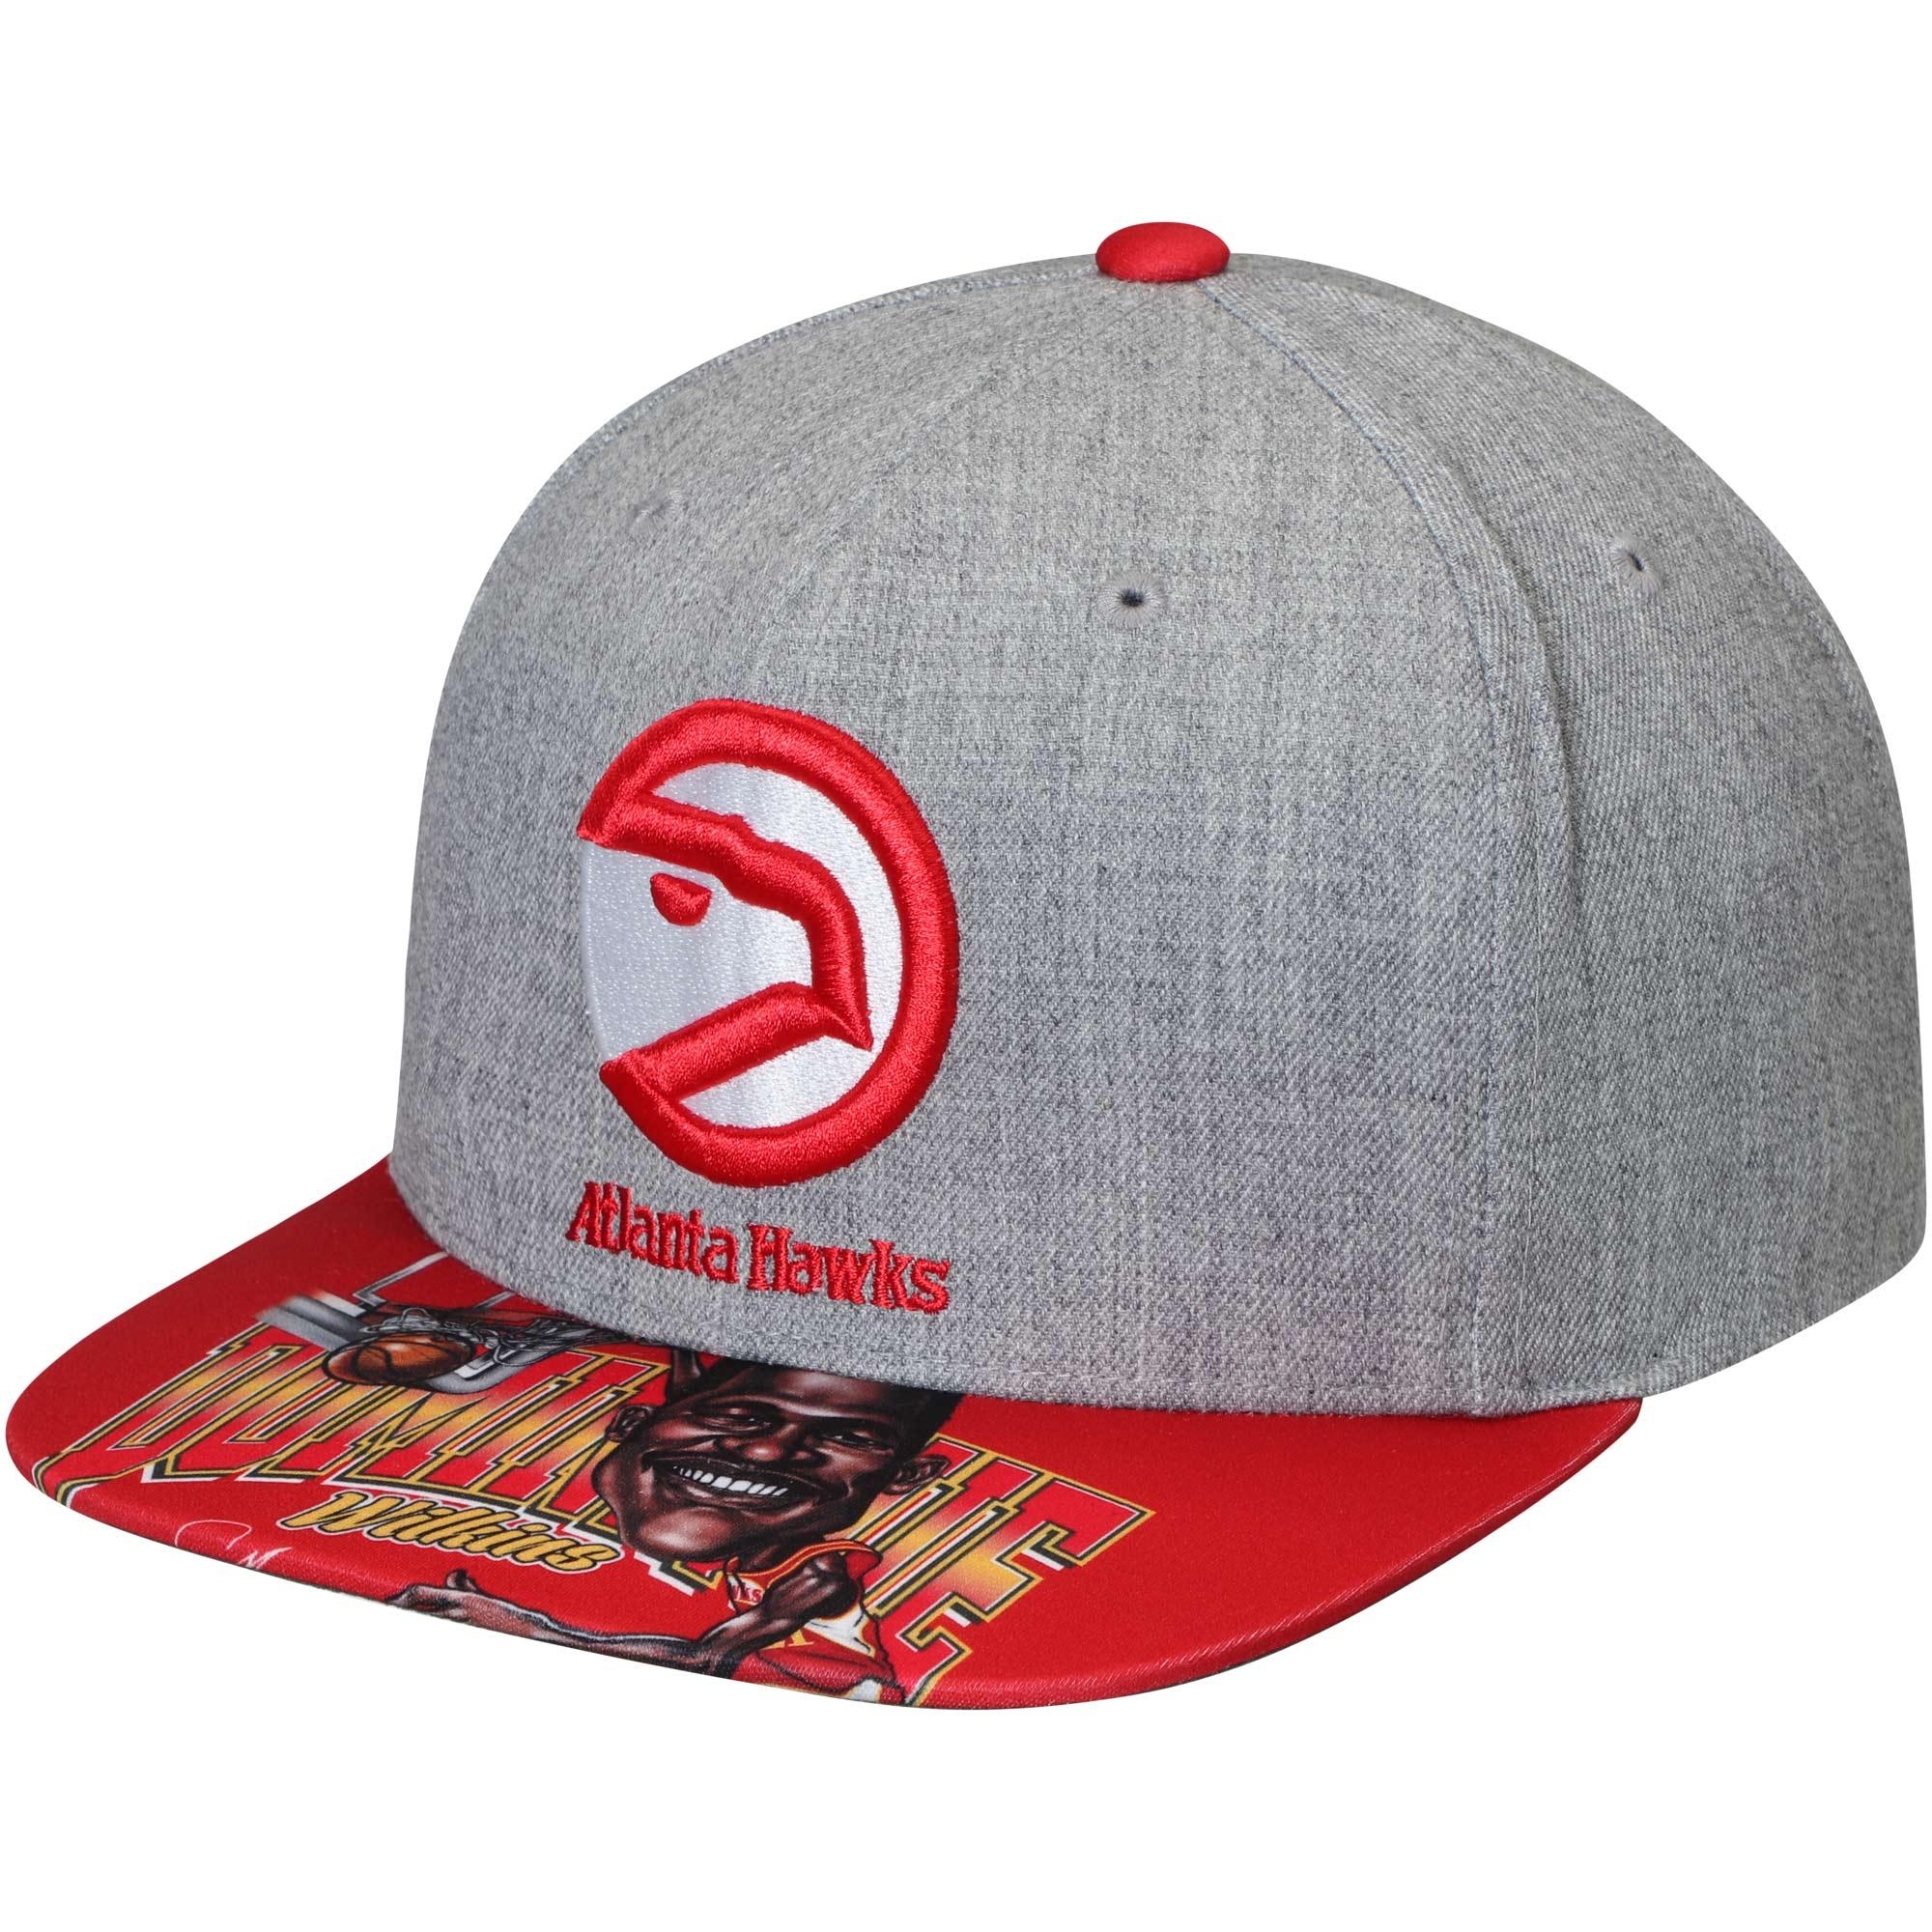 Dominique Wilkins Atlanta Hawks Mitchell & Ness Caricature Snapback Adjustable Hat - Gray